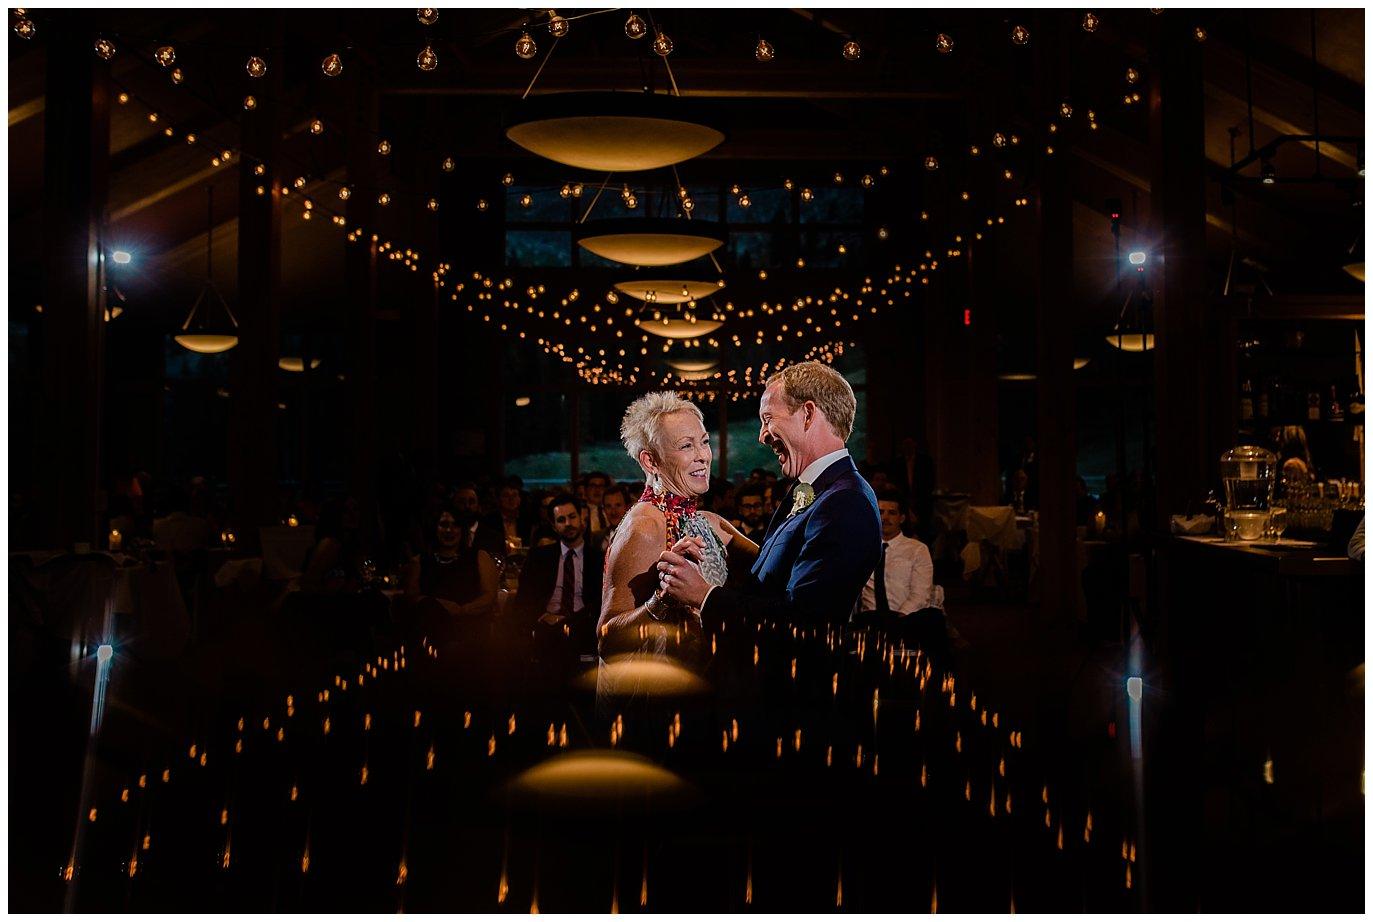 creative mother son dance at Arapahoe Basin Black Mountain Lodge Wedding by Denver Wedding Photographer Jennie Crate